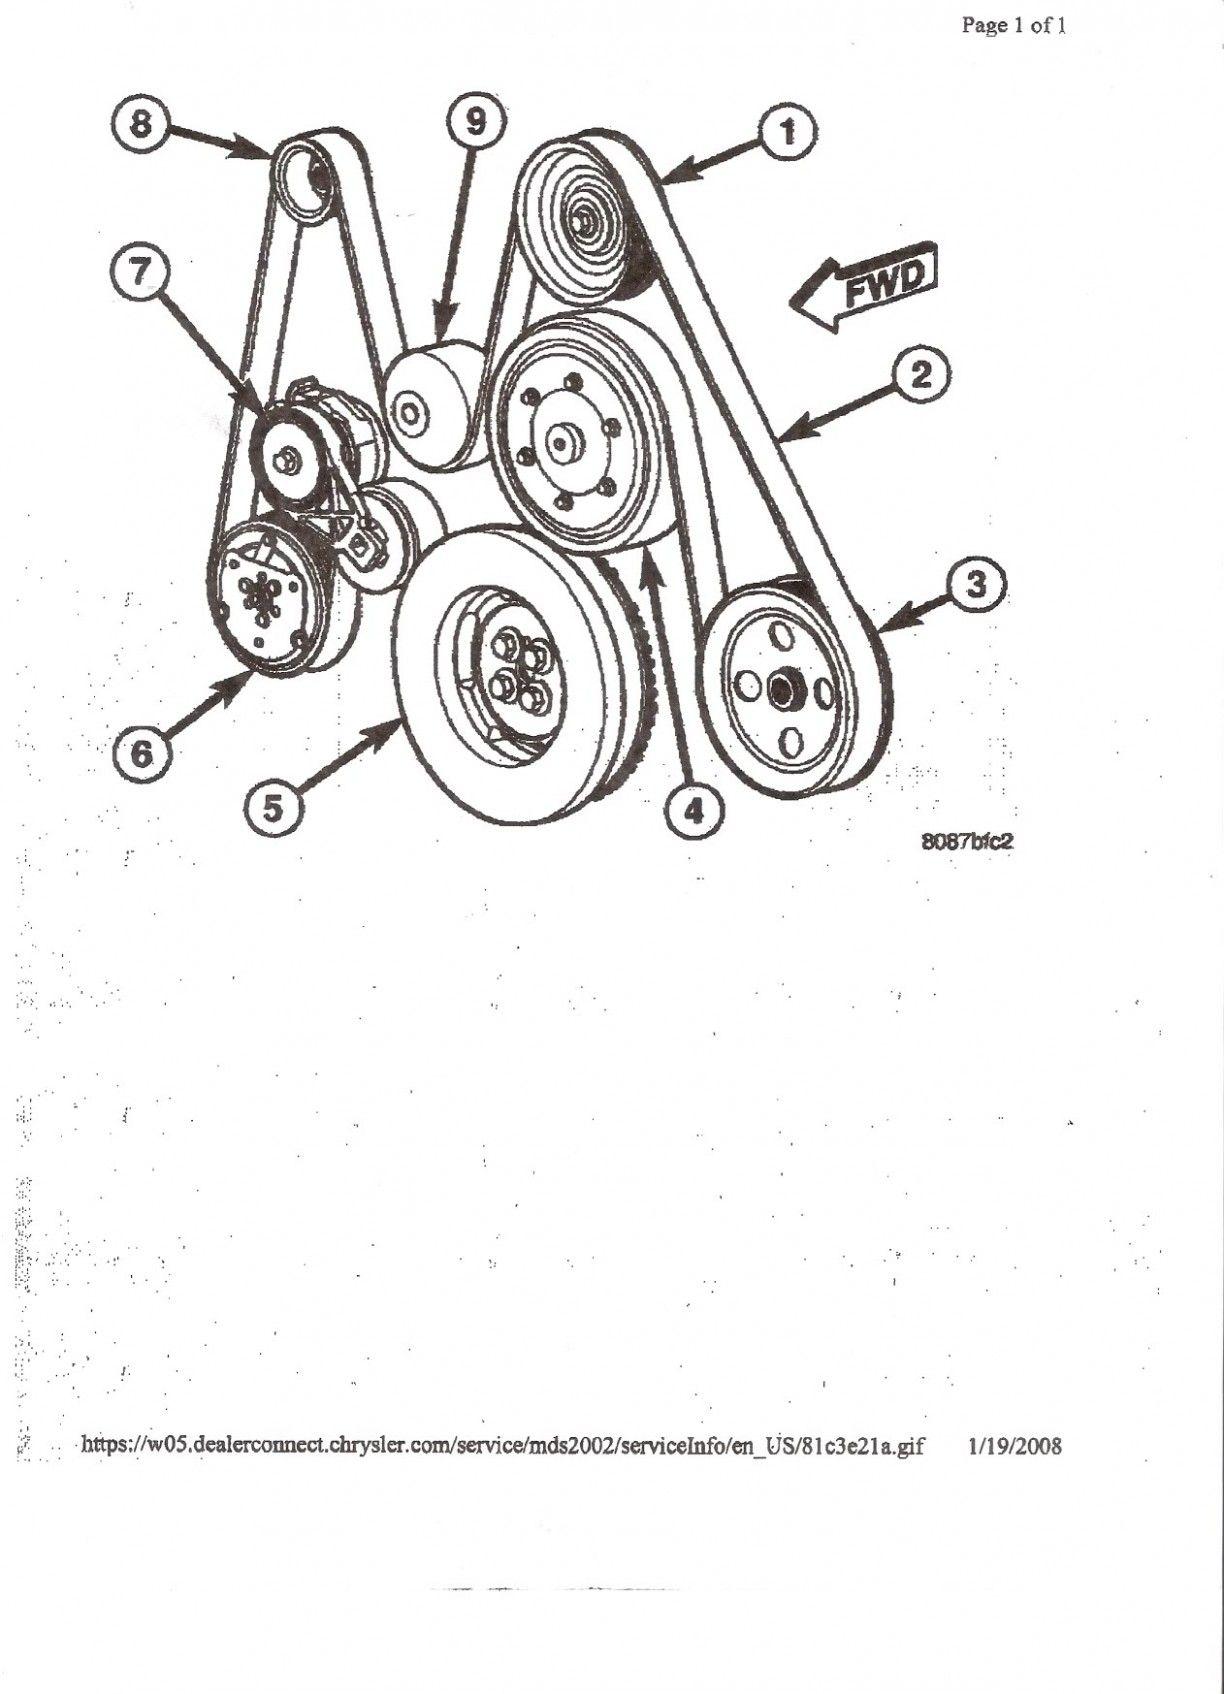 Check the Belts: 2006-2013 BMW 325i - 2006 BMW 325i 3.0L 6 Cyl.